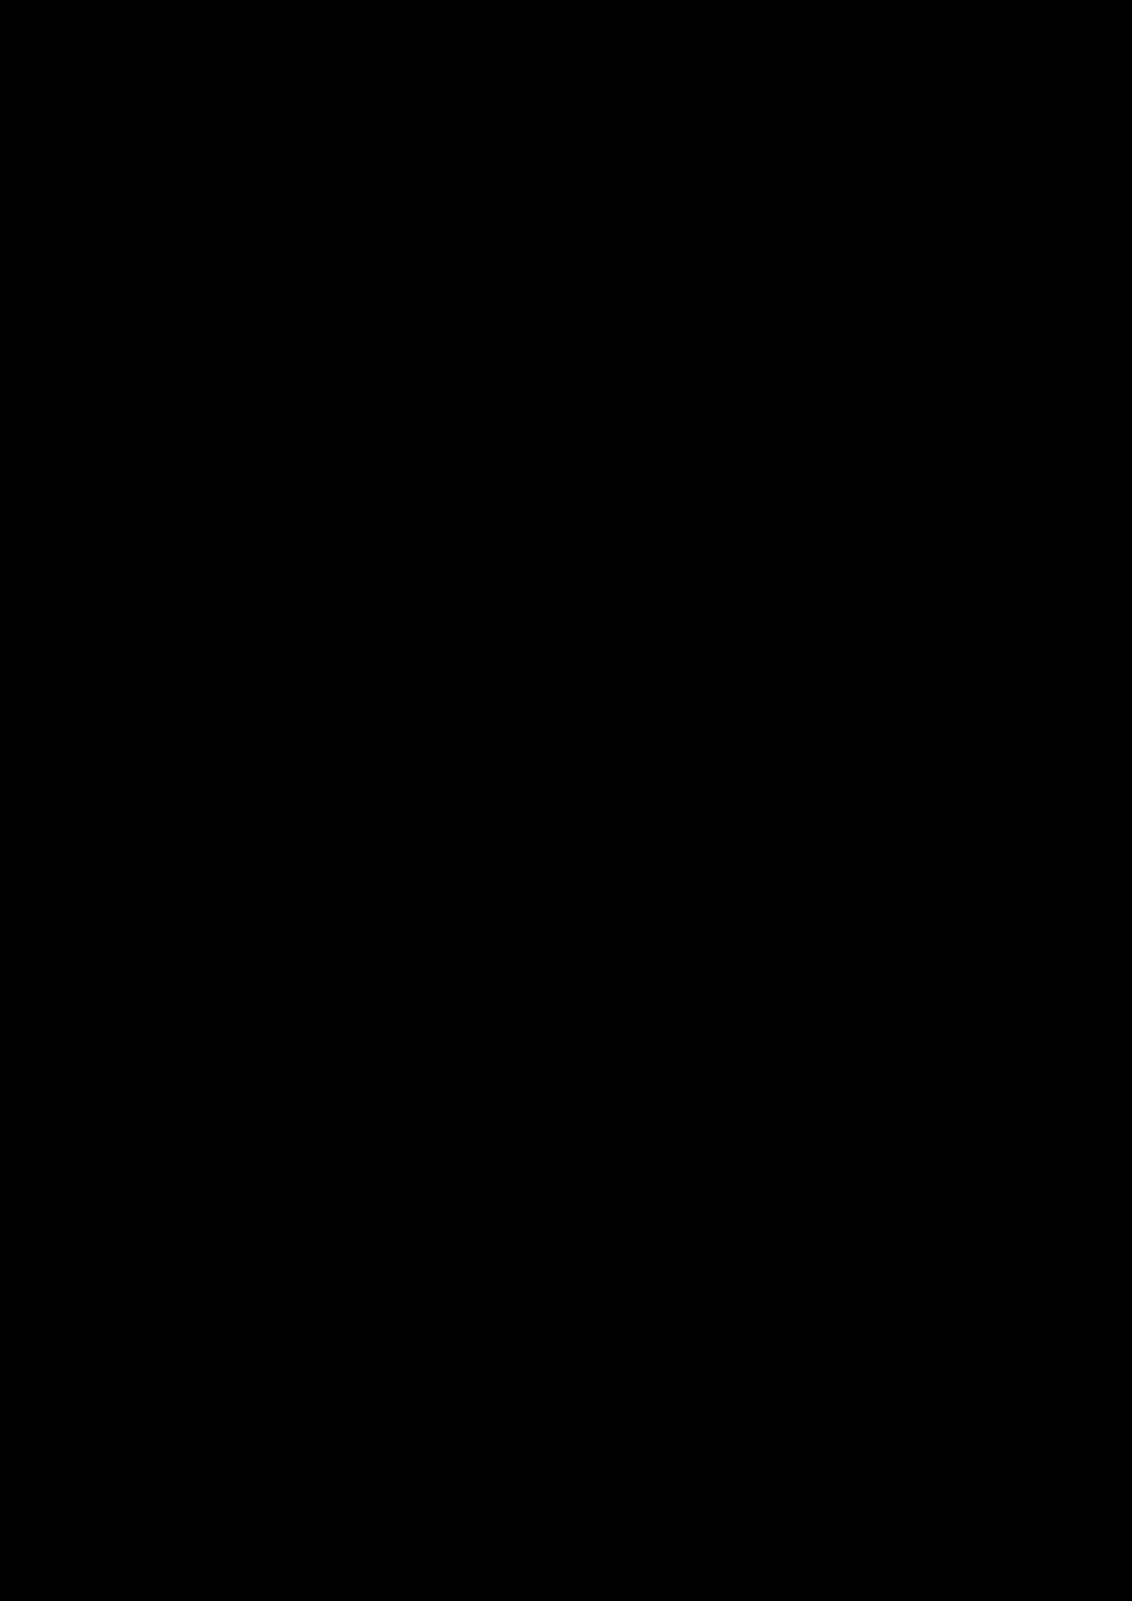 Prosti slide, Image 15